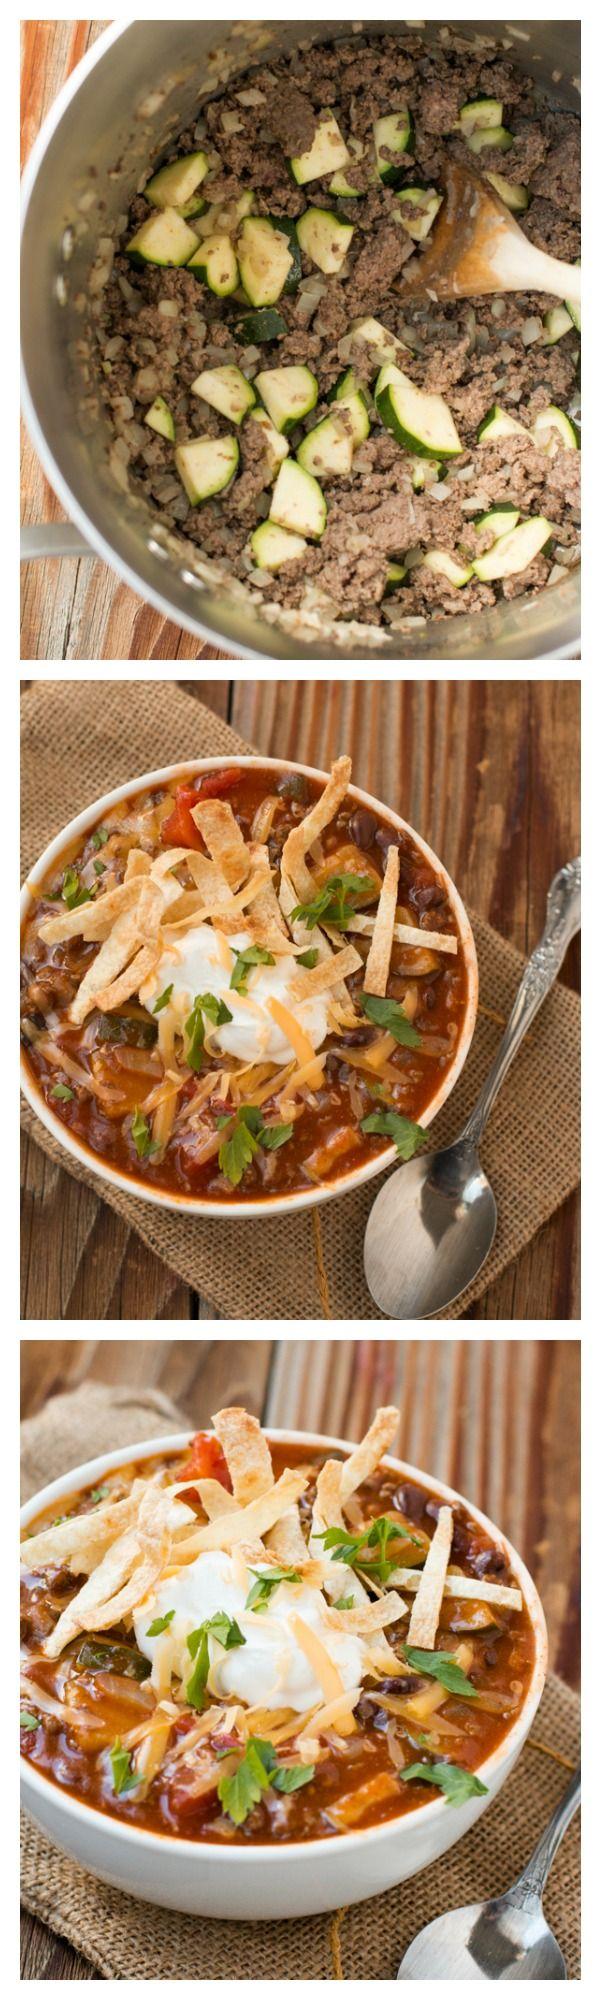 Enchilada Soup - Oh Sweet Basil